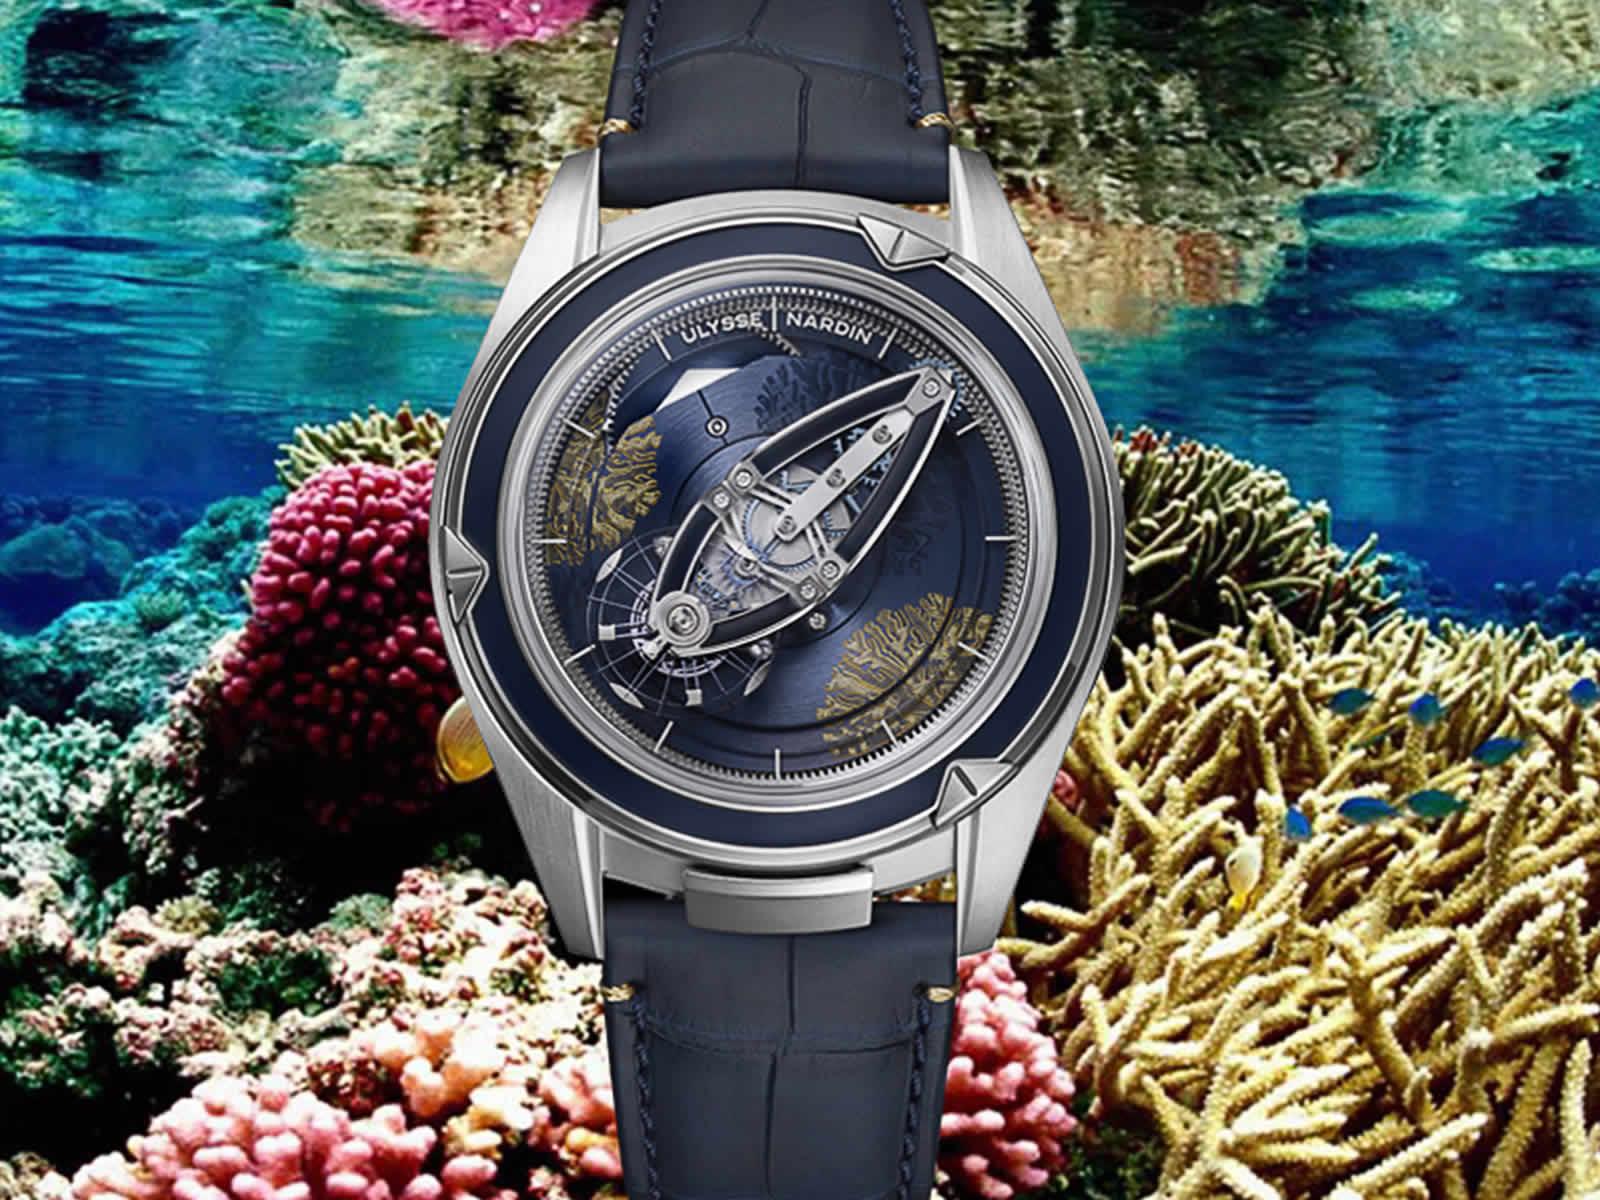 ulysse-nardin-freak-vision-coral-bay-4-.jpg